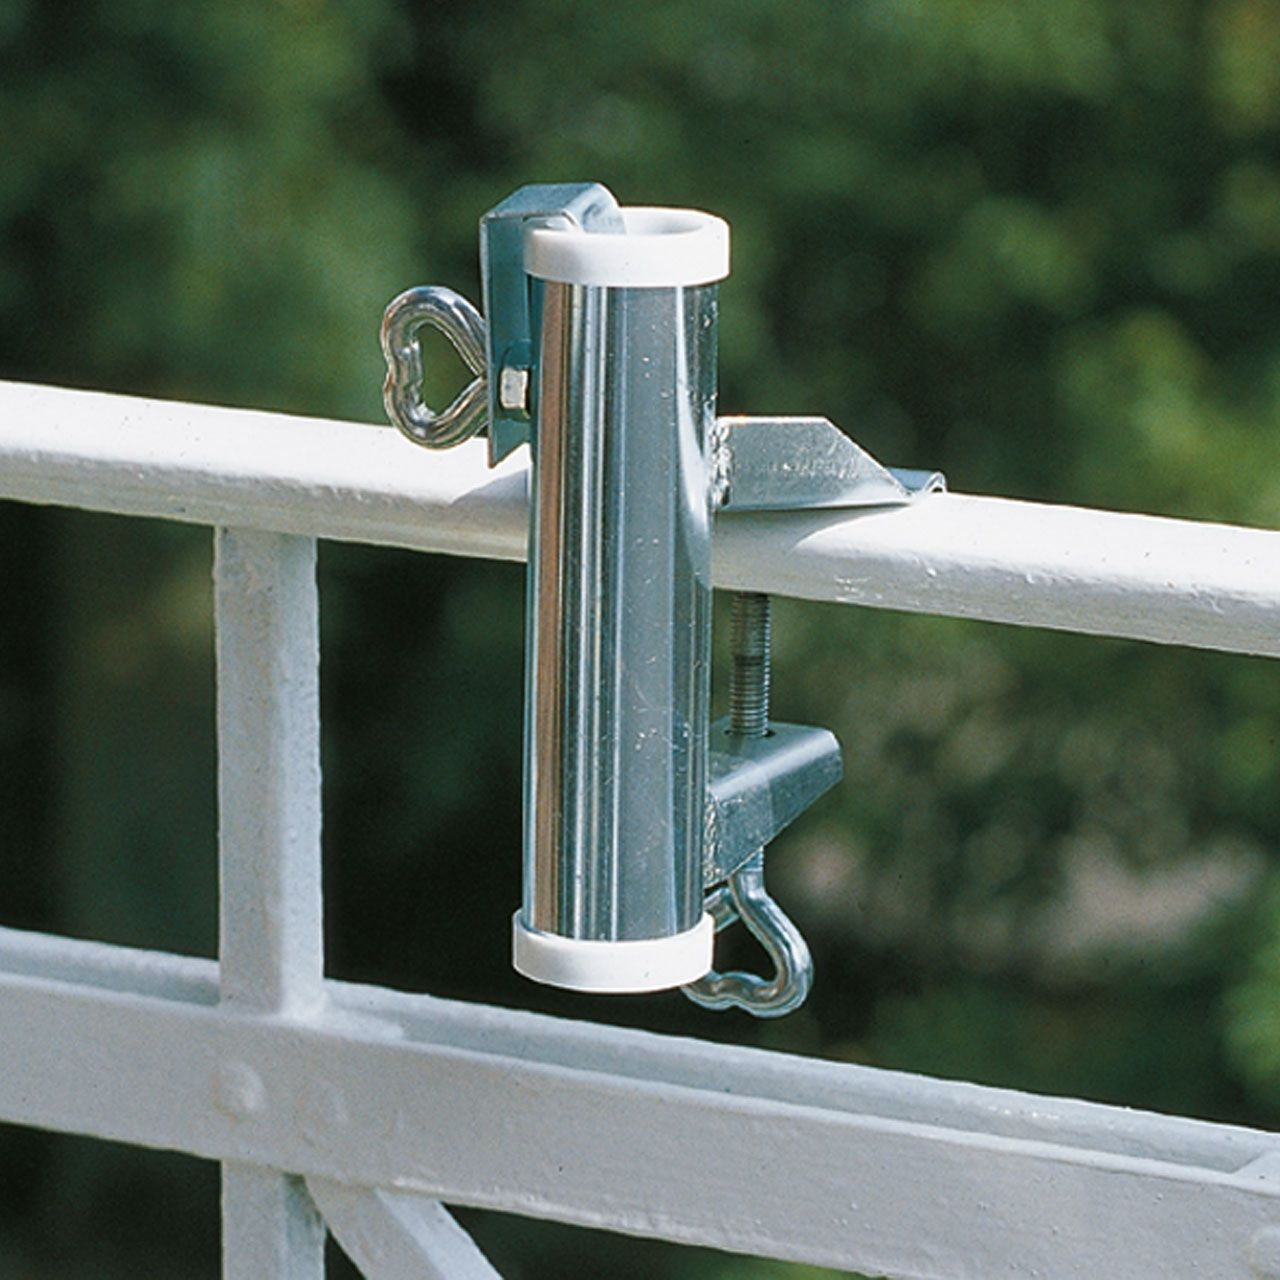 Doppler Balkonklammer Balkon Sonnenschirmhalter Sonnenschirm 25 bis 32 mm NEU